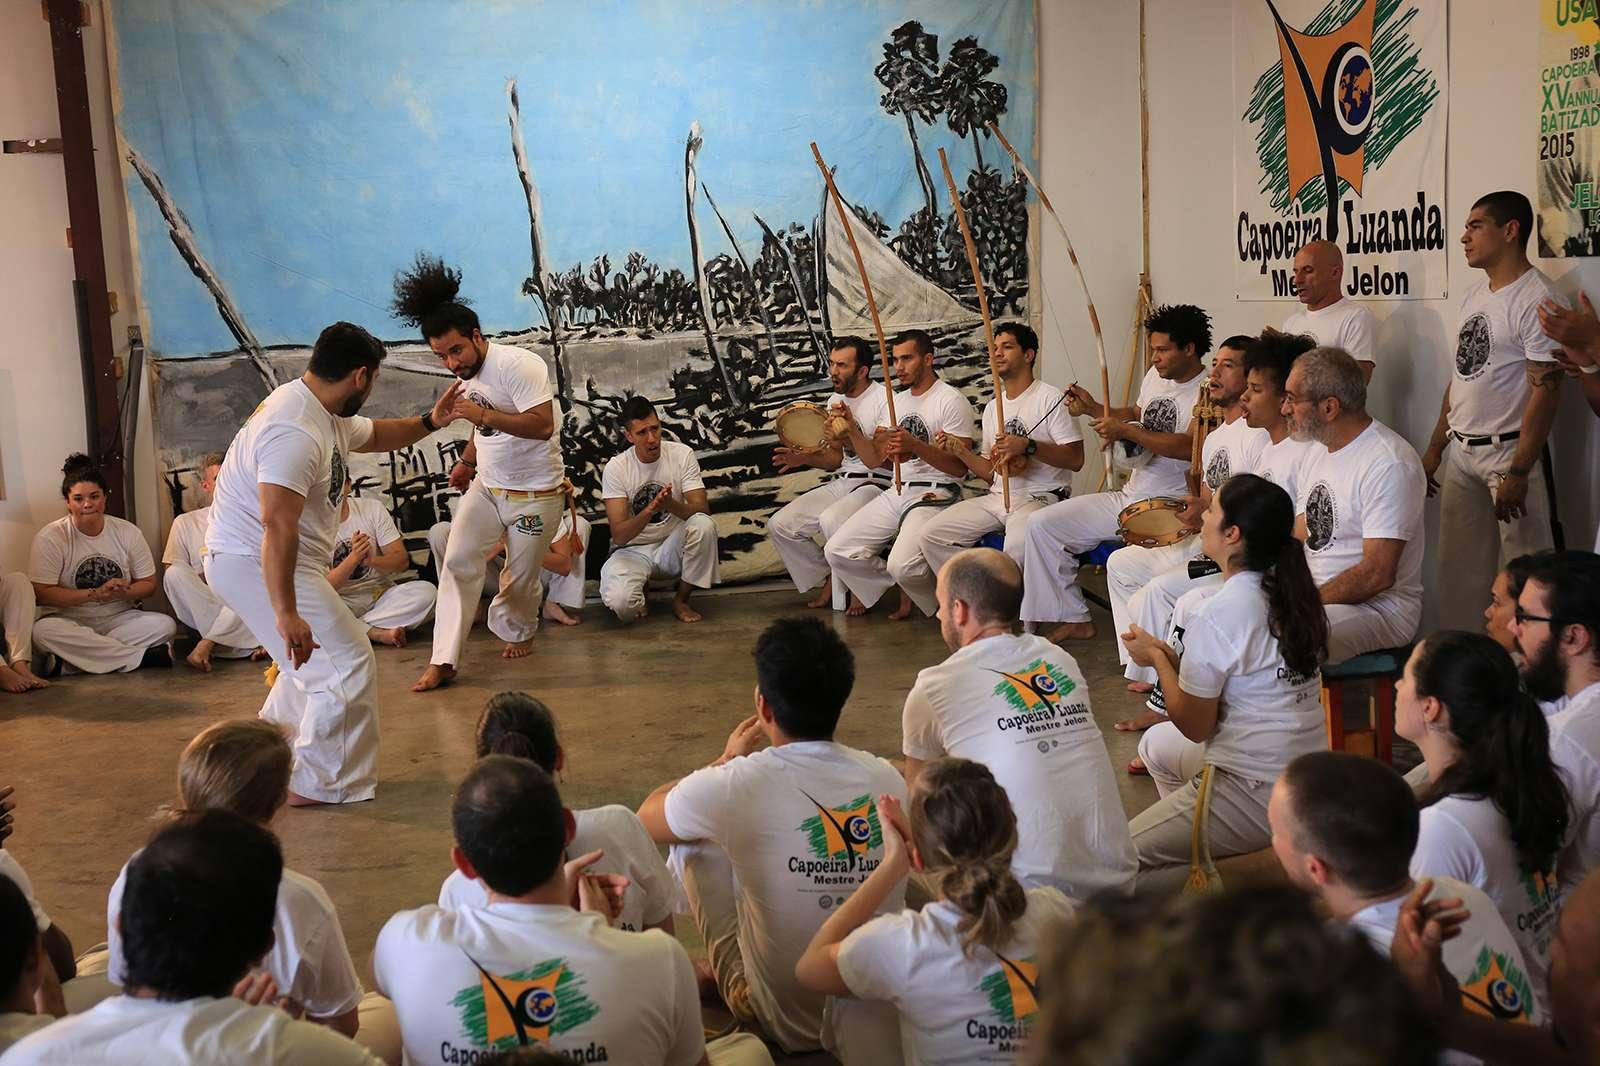 Brazilian Arts Foundation, Capoeira performance